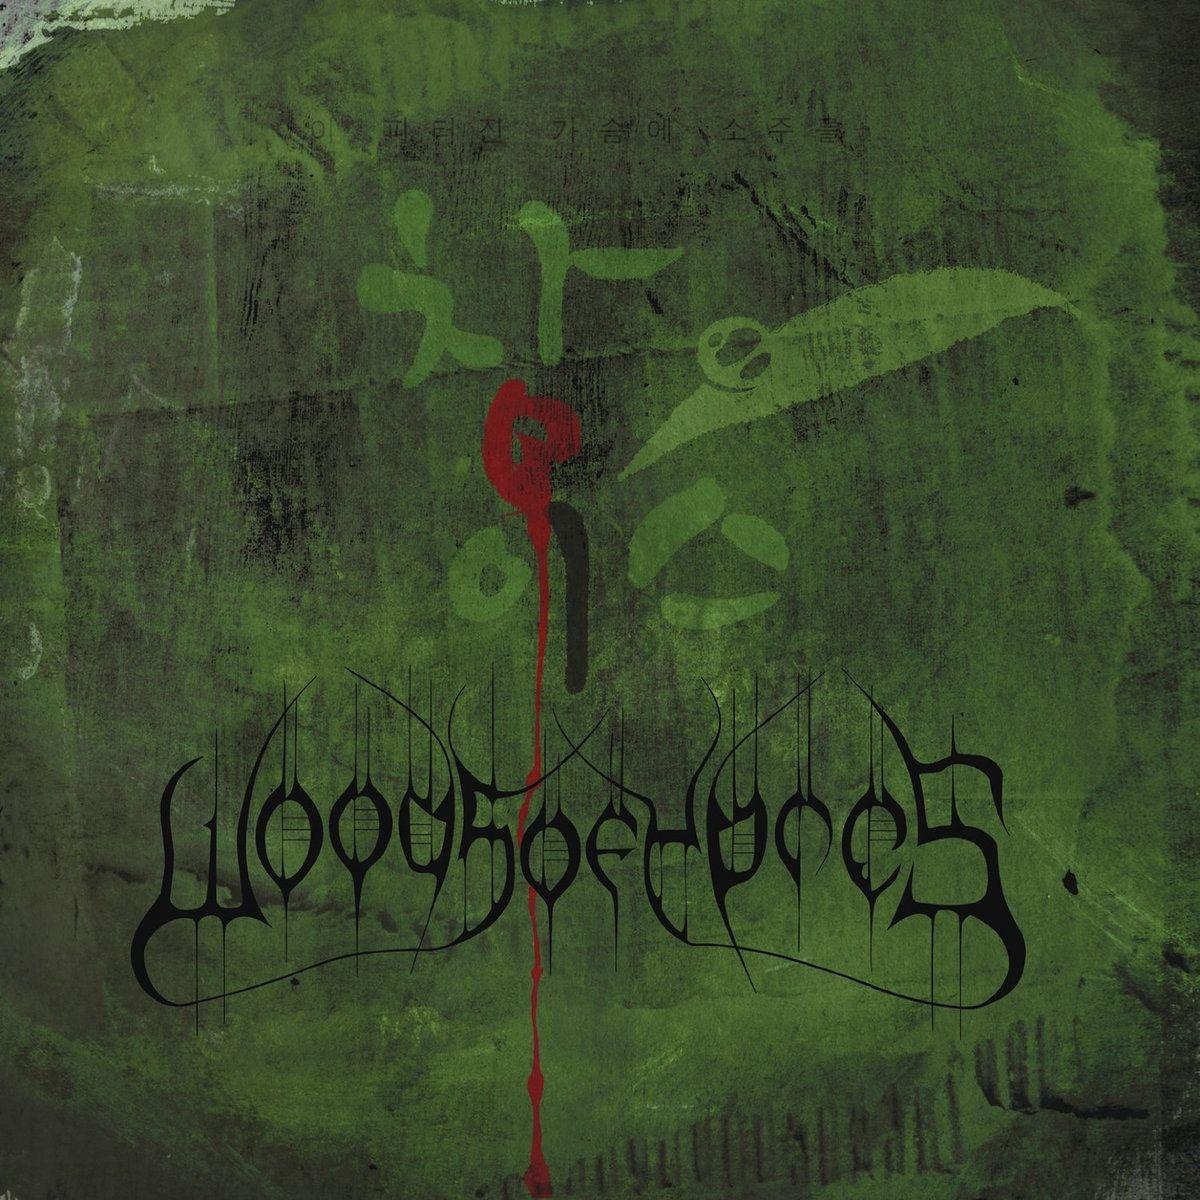 Woods IV: The Green Album